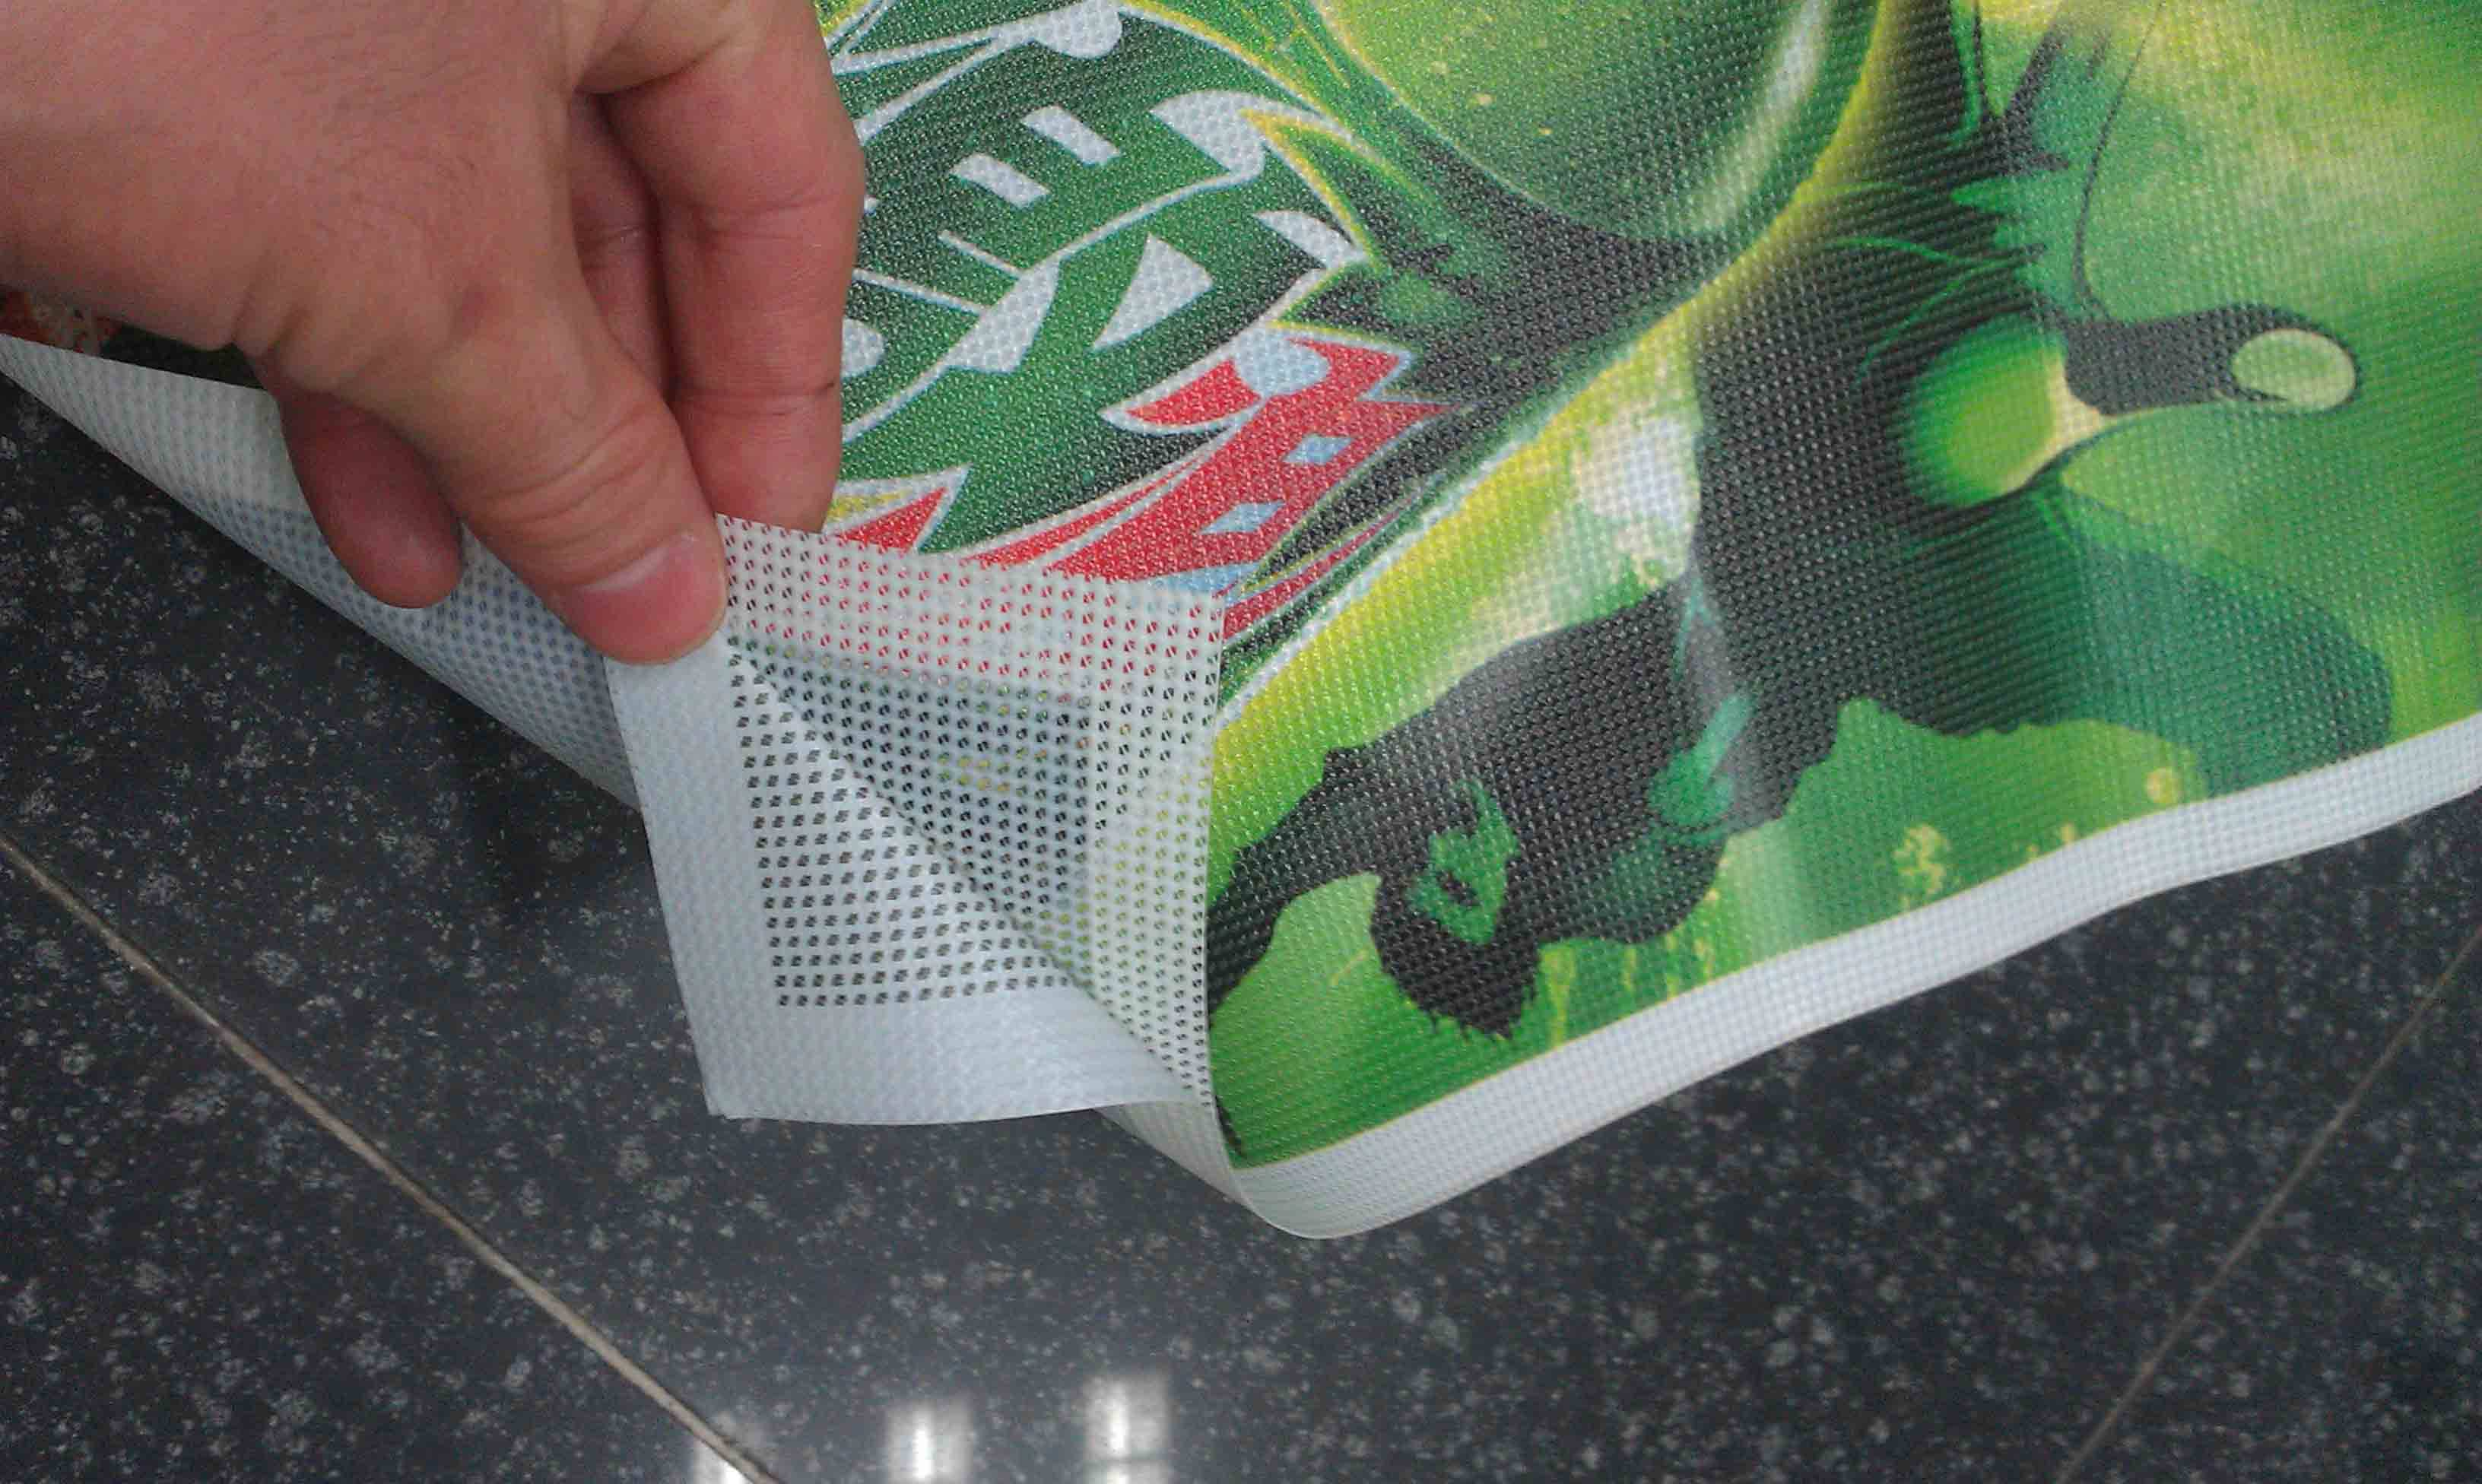 Digital print / screen printed one way vision window sticker